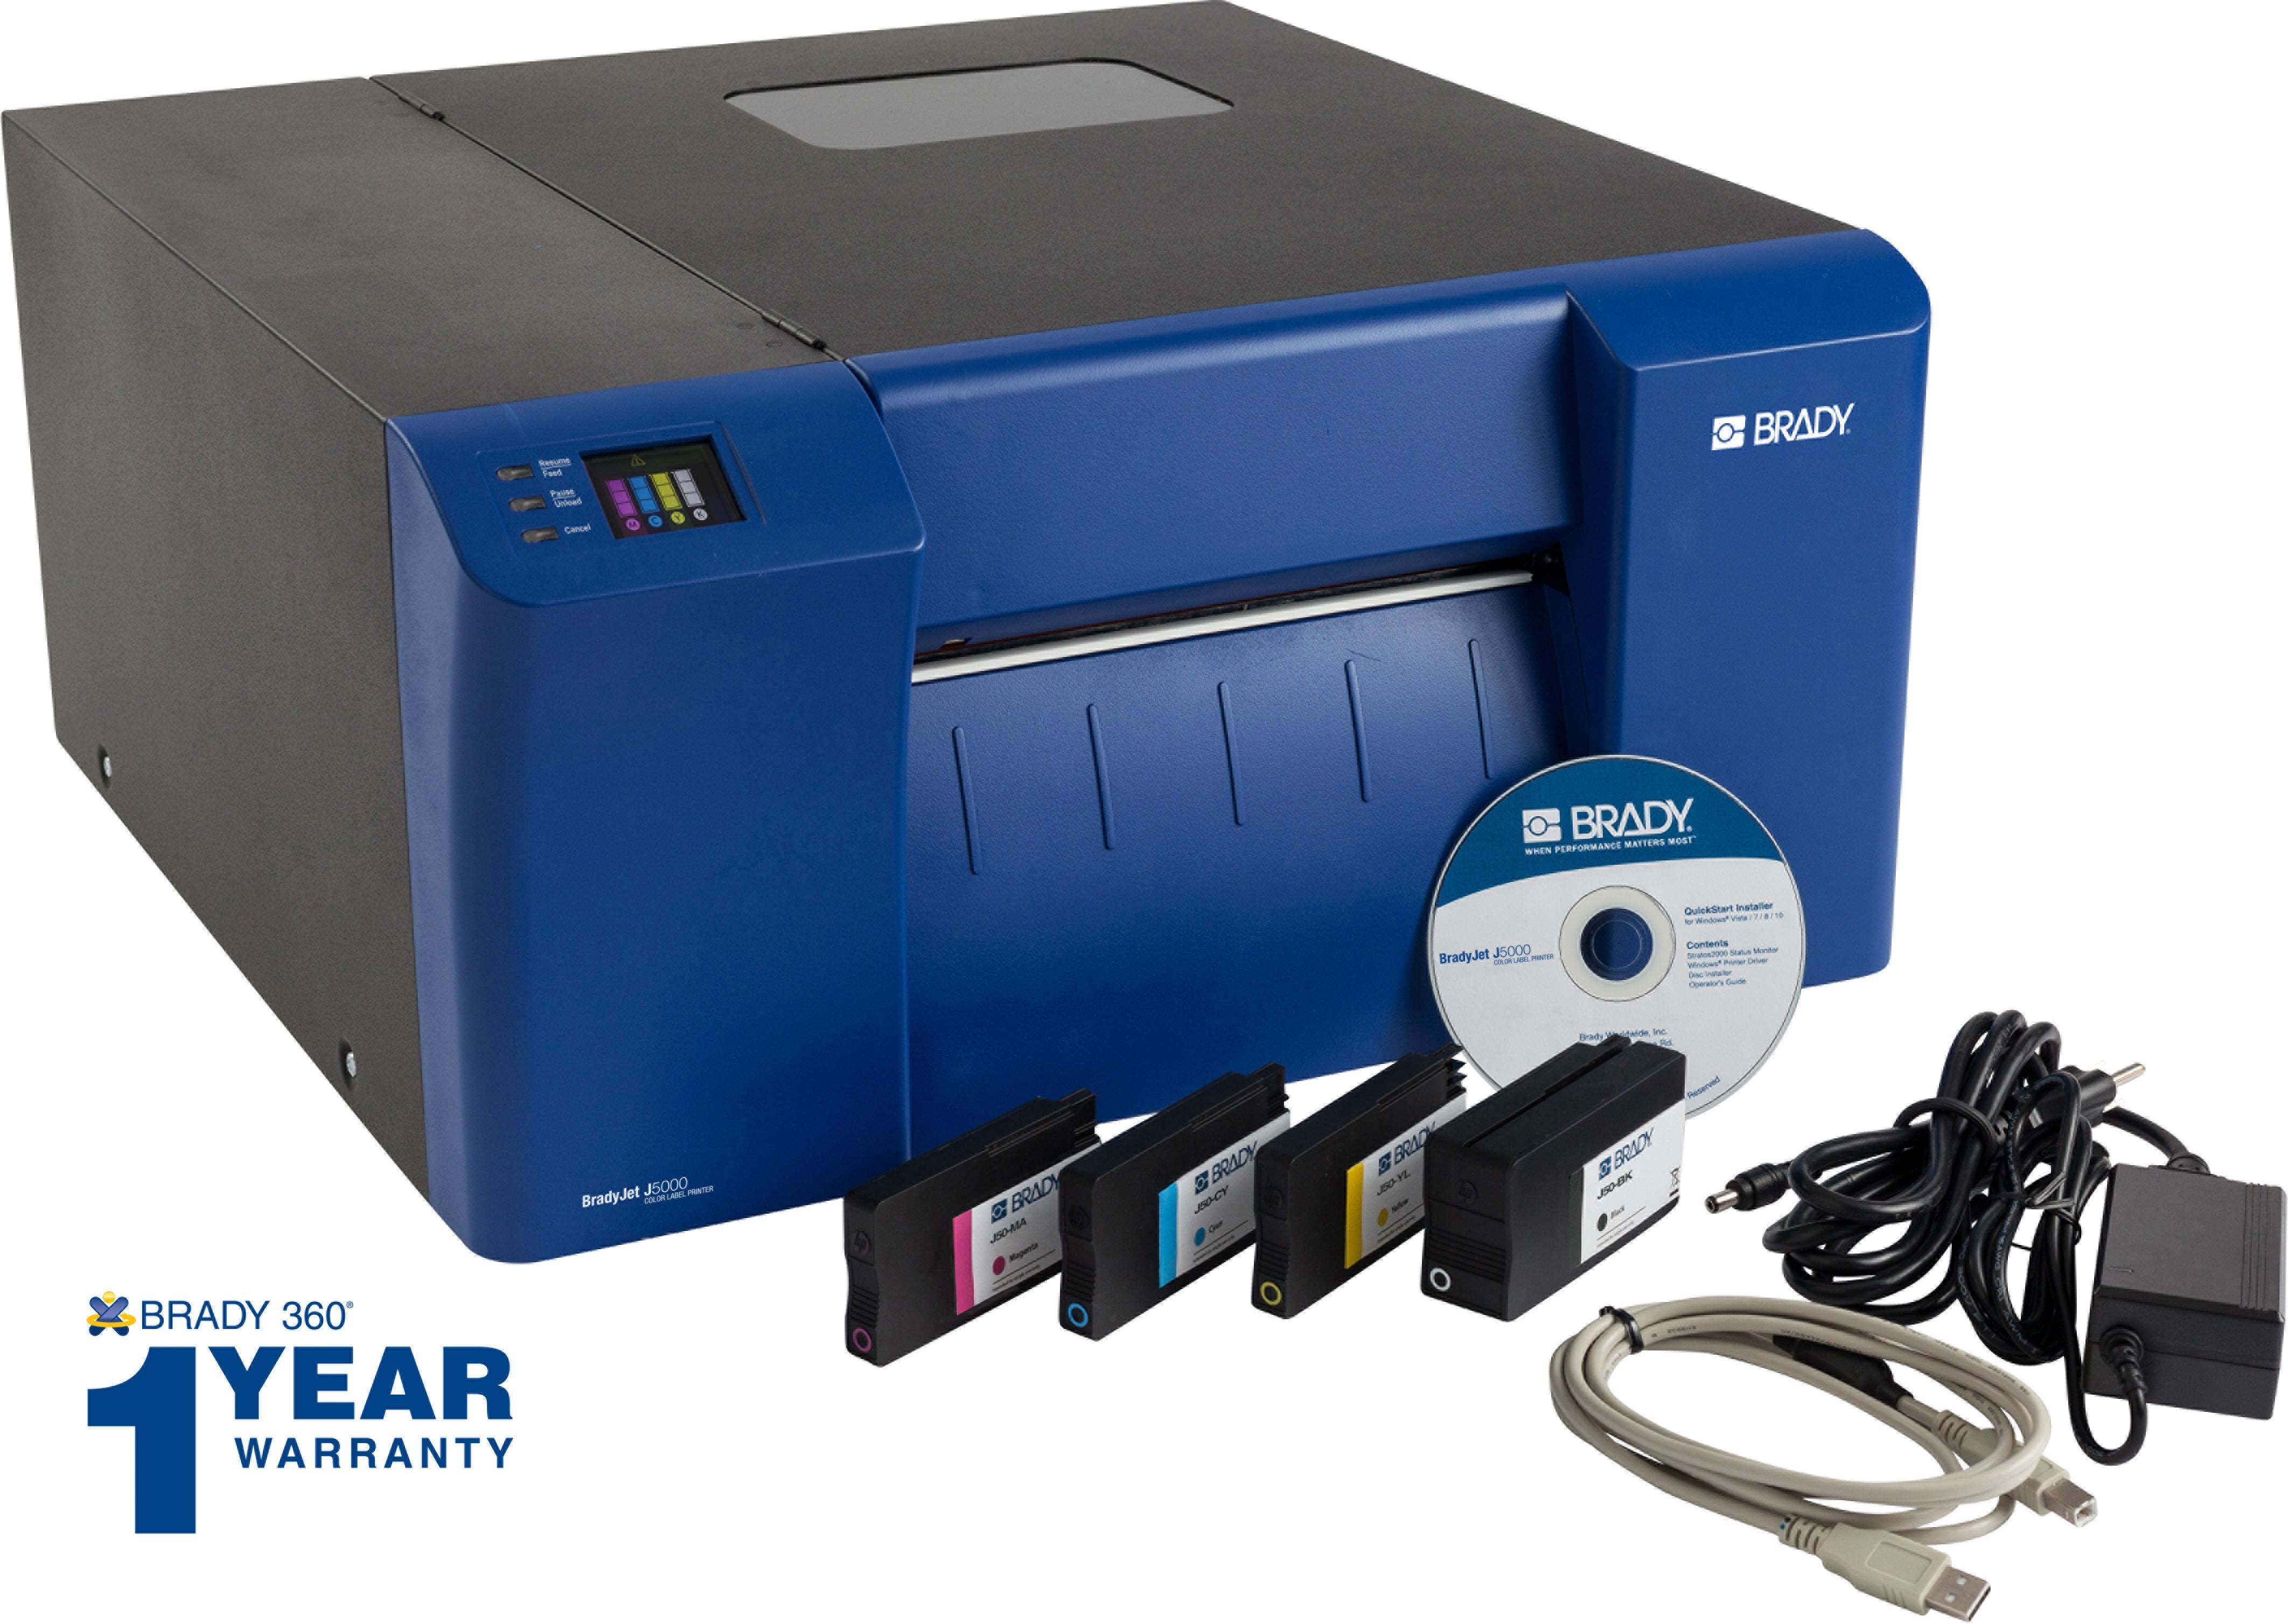 Amazon.com: Brady J5000 impresora de etiquetas a tinta ...